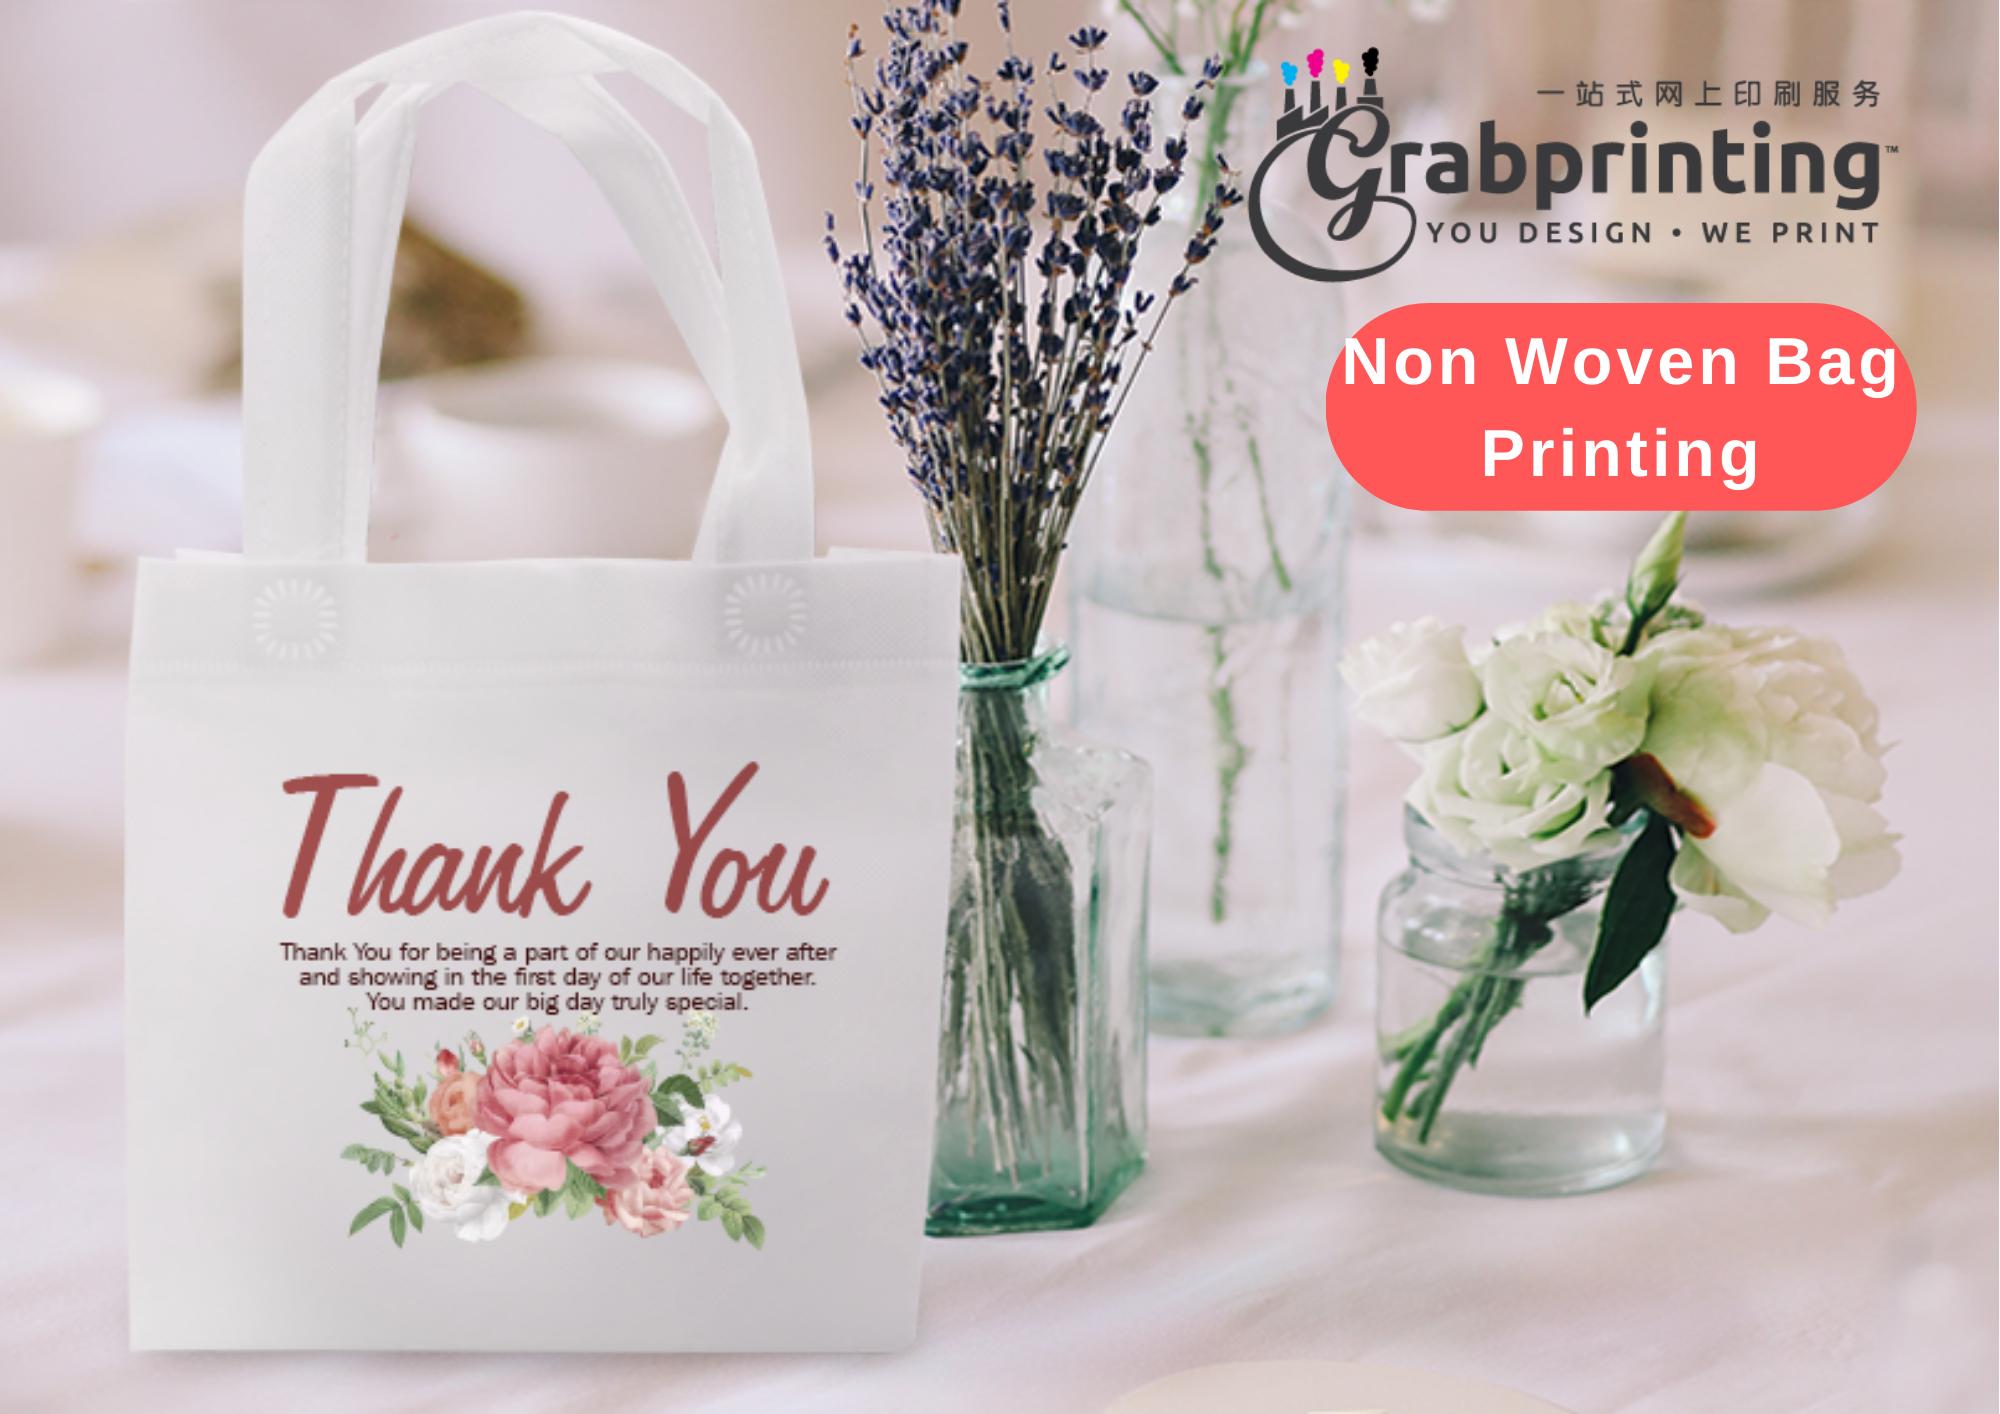 Non Woven Bag Printing Non woven bag printing 4